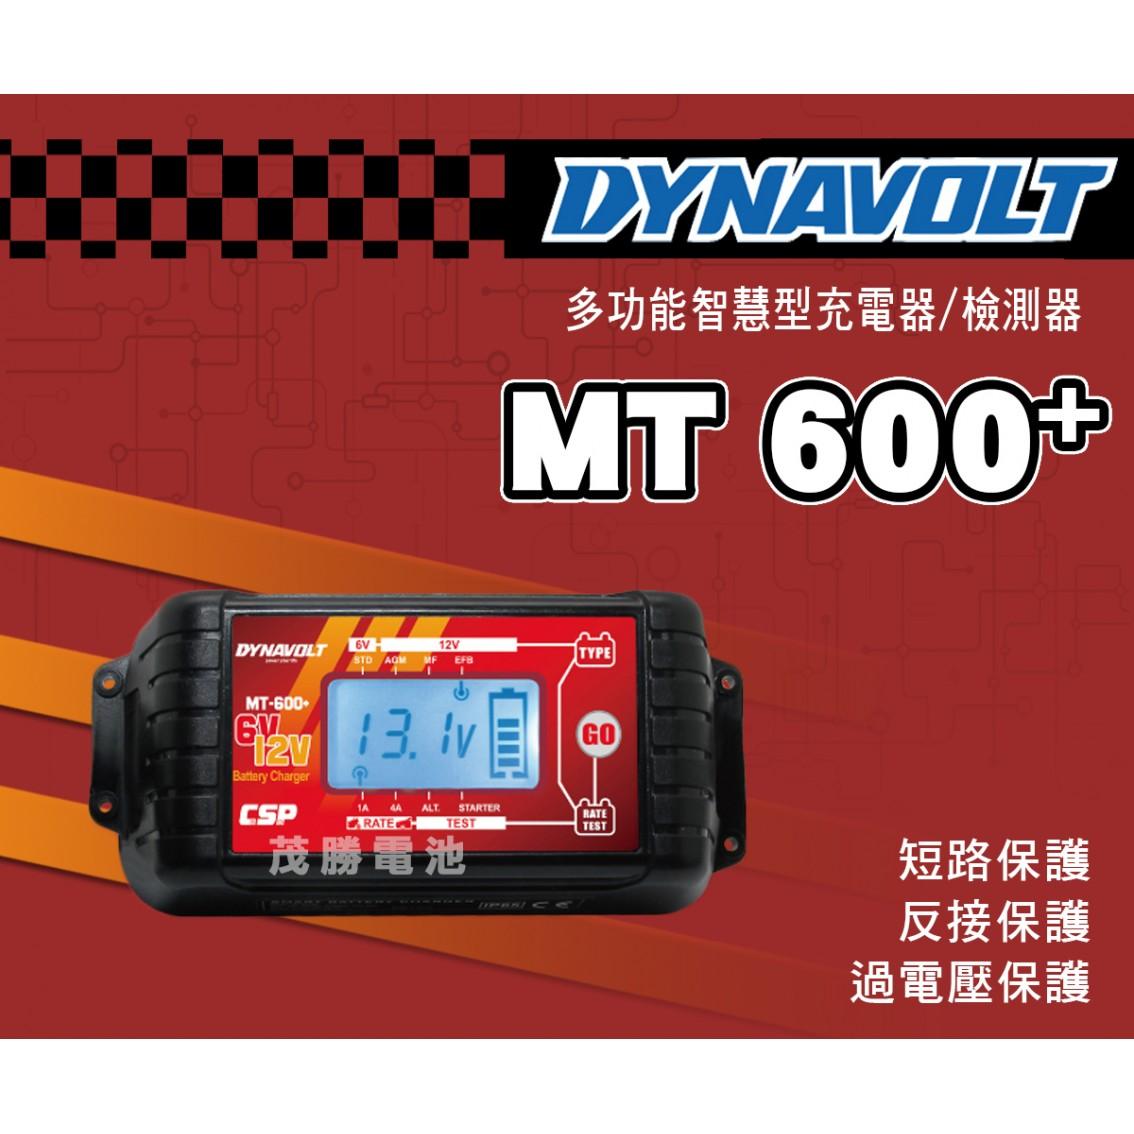 MT-600+